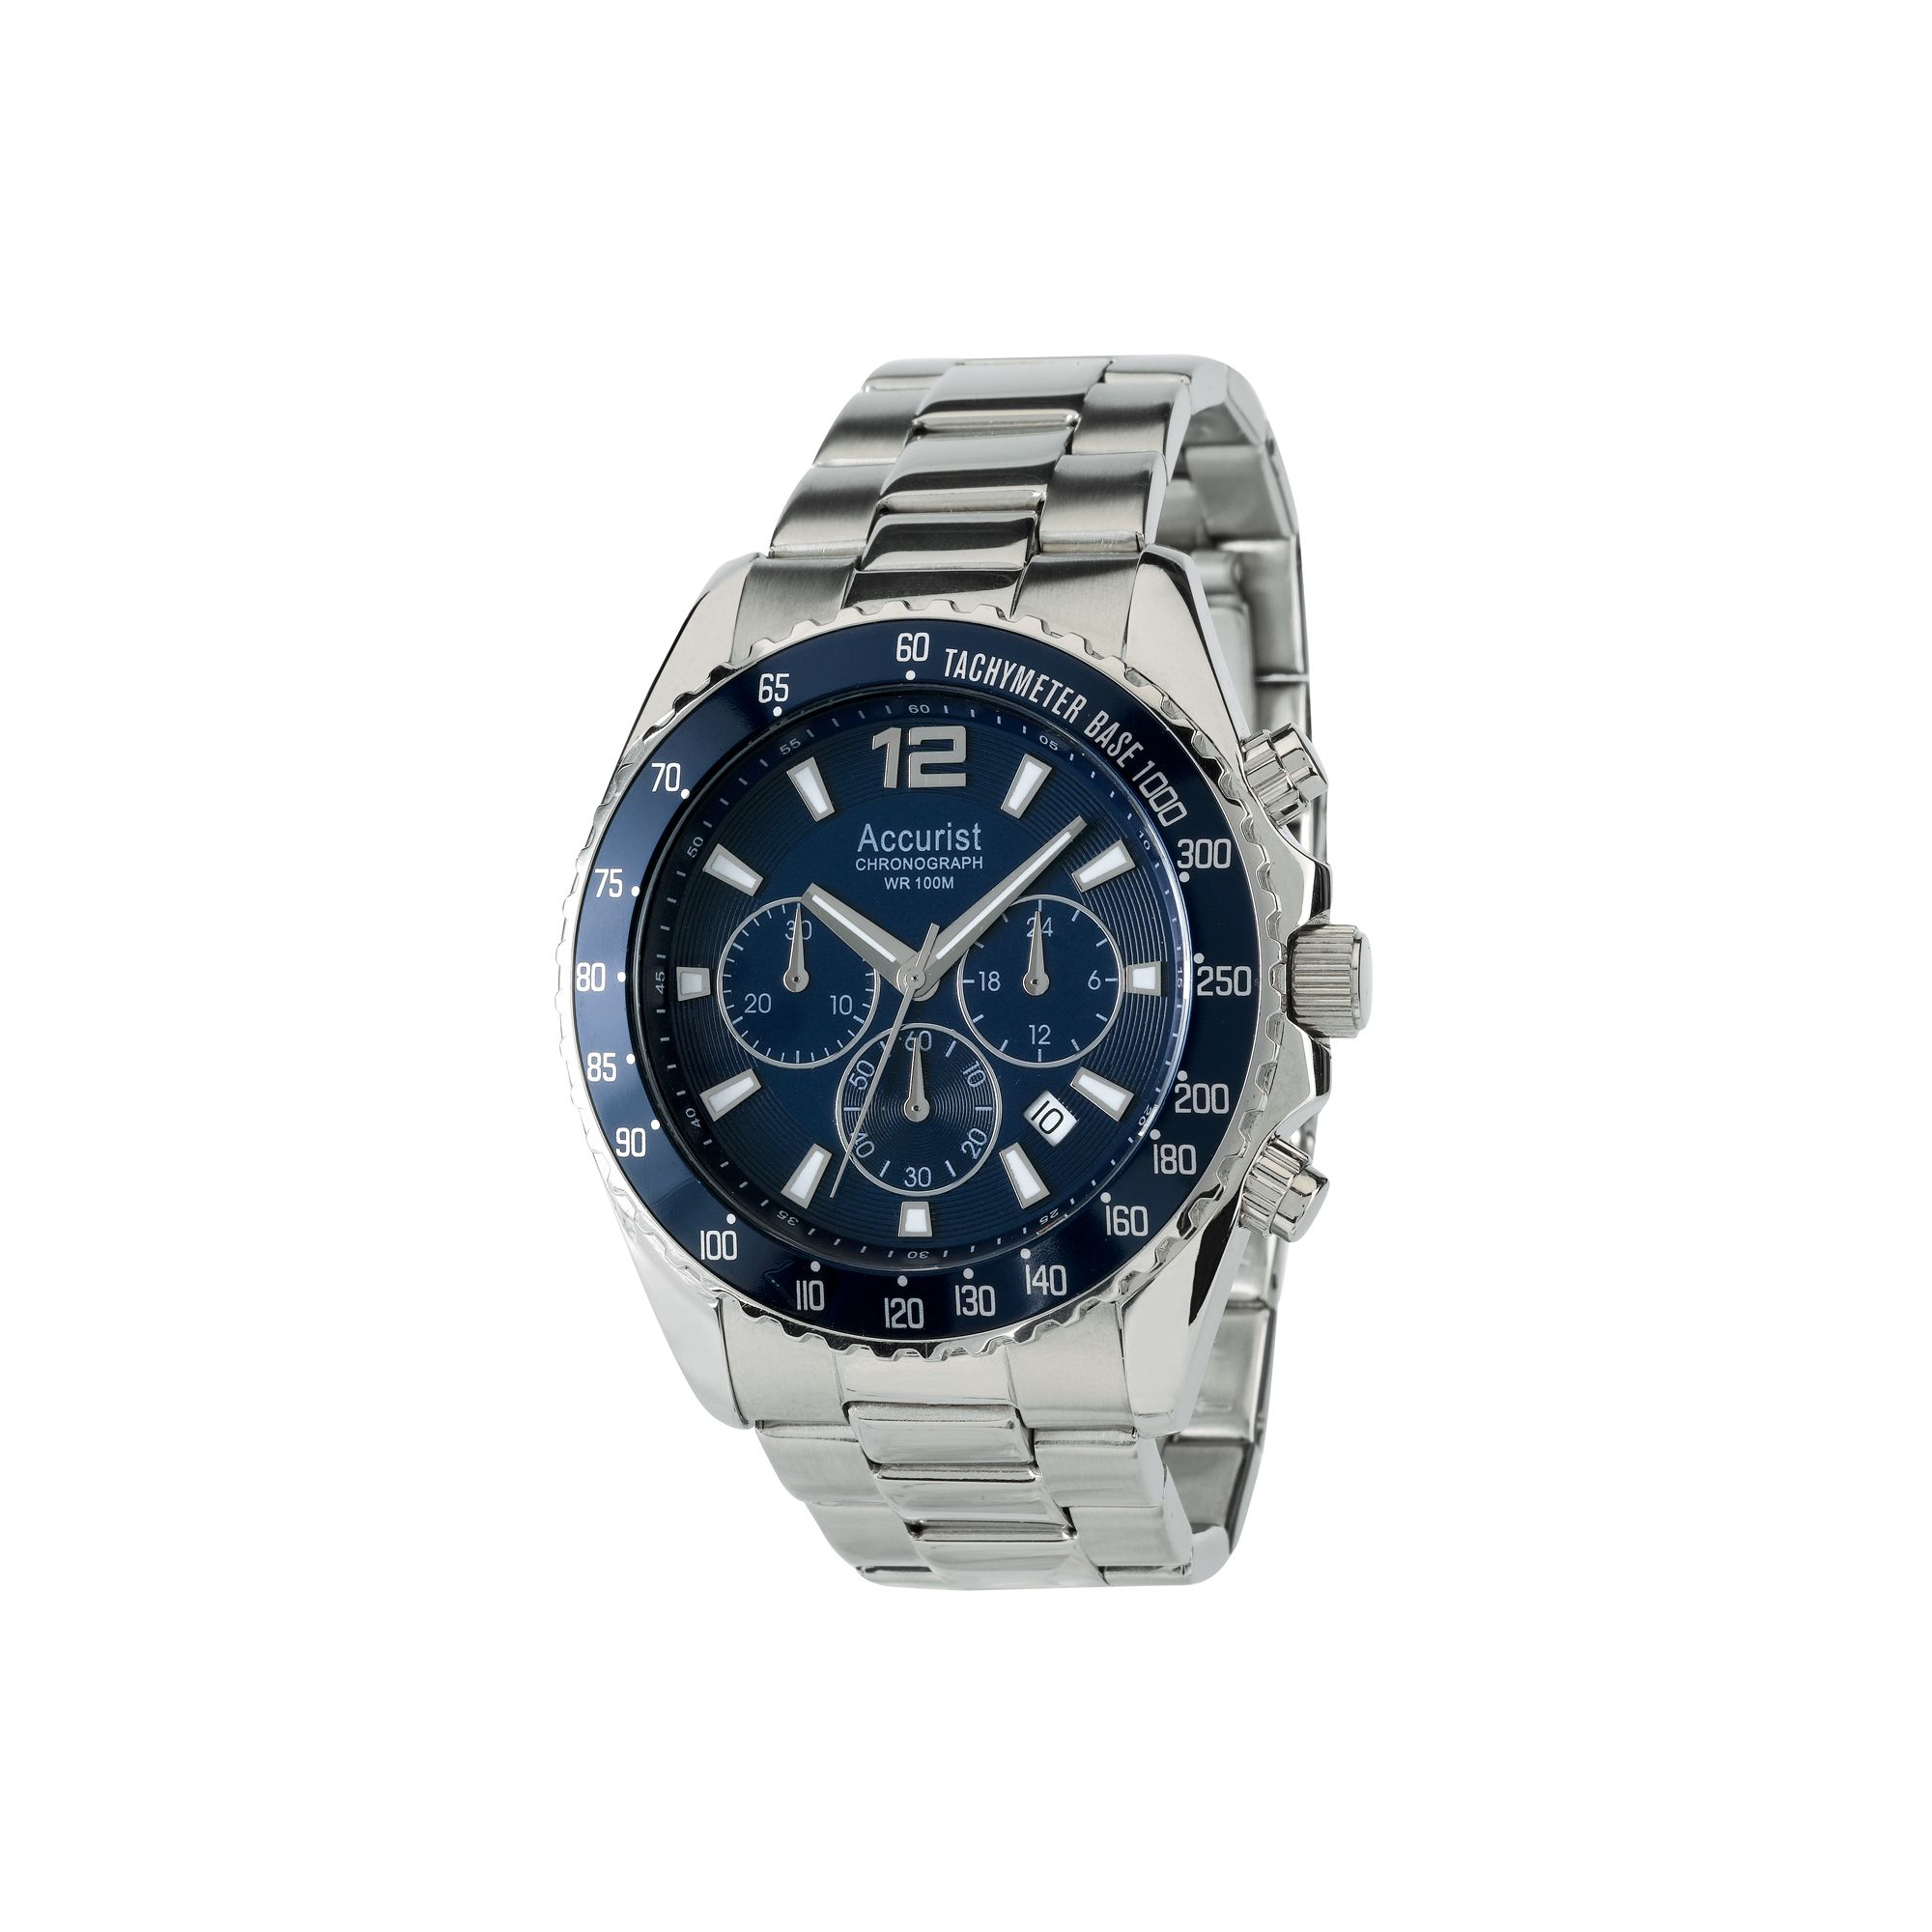 myshop accurist gents chronograph bracelet watch mb936nn